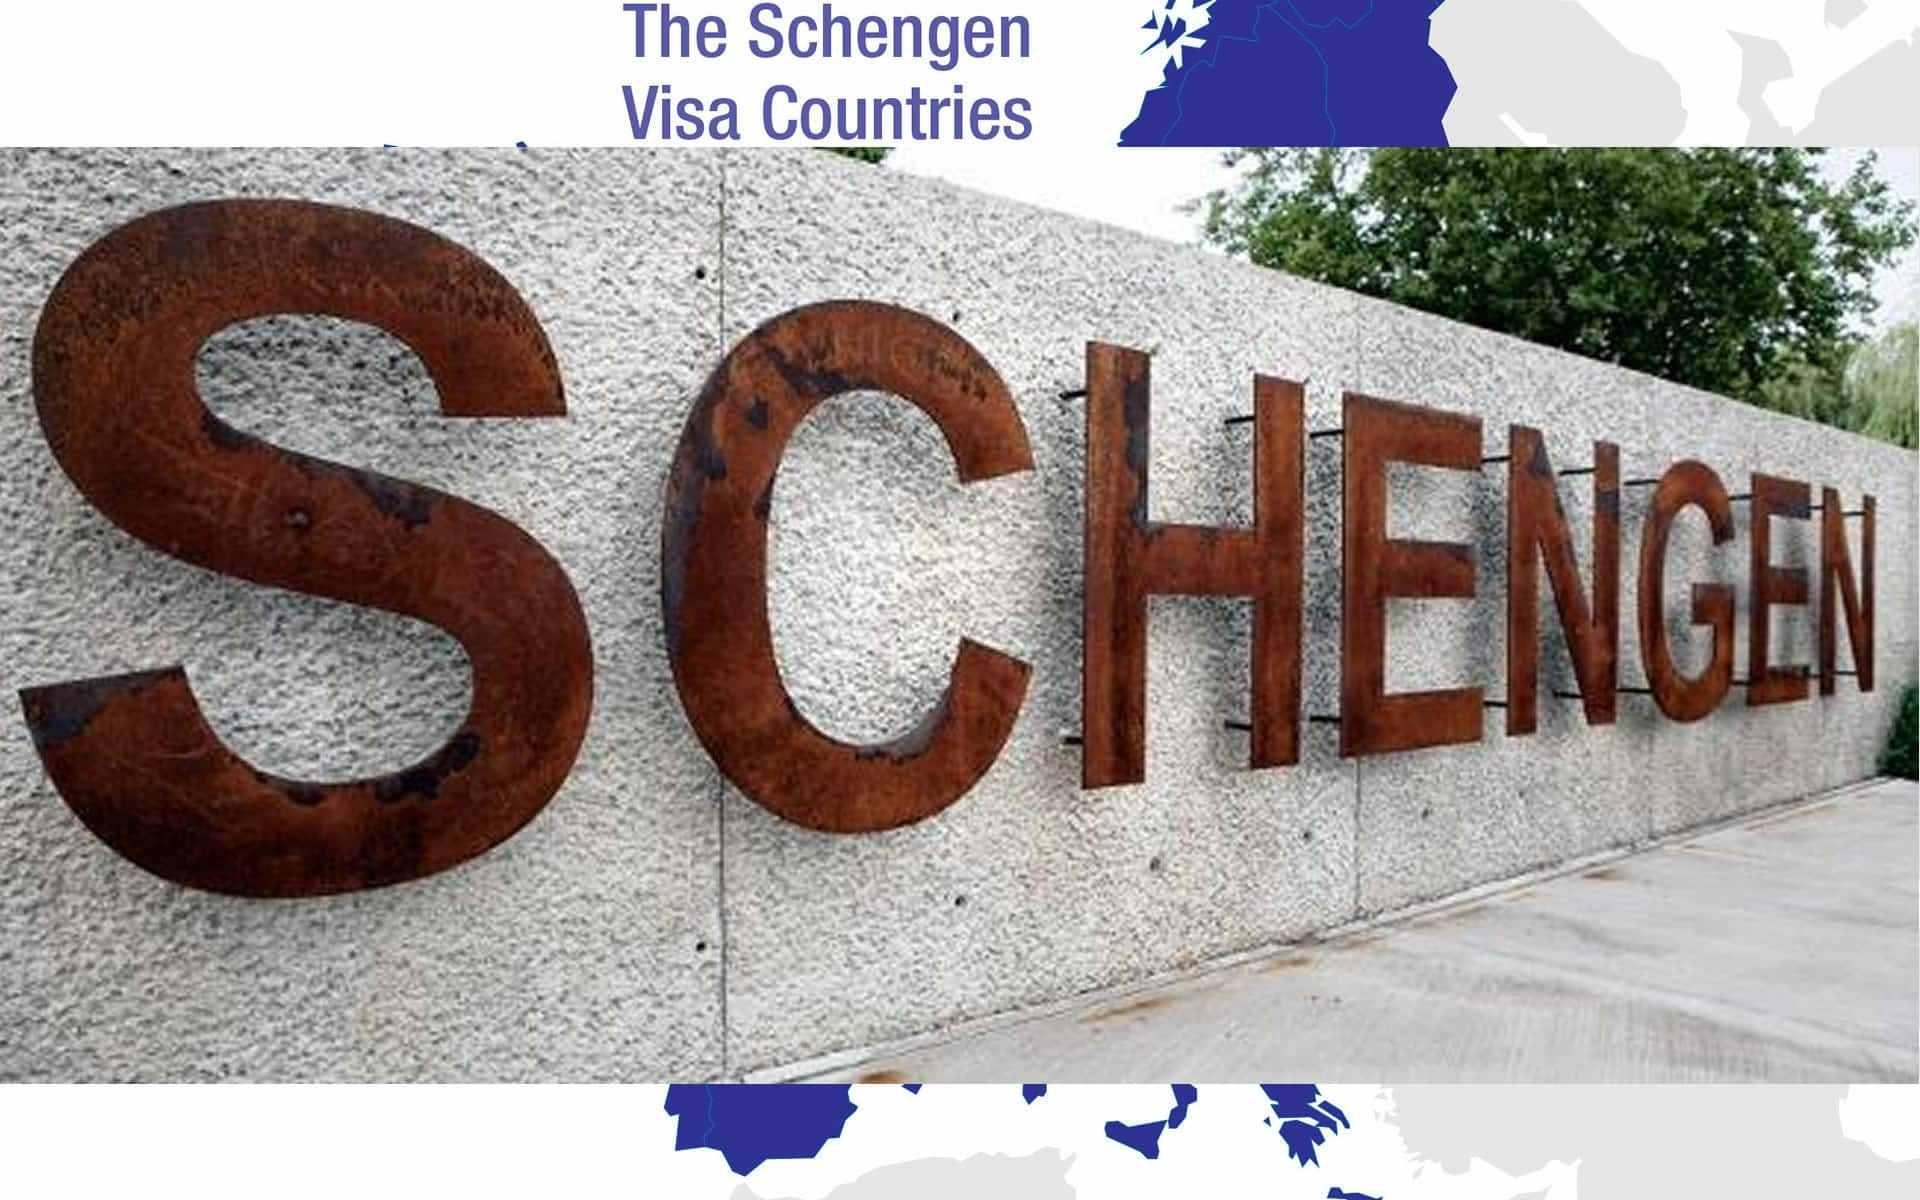 thu tuc xin visa di cac nuoc chau au visa schengen nhu the nao